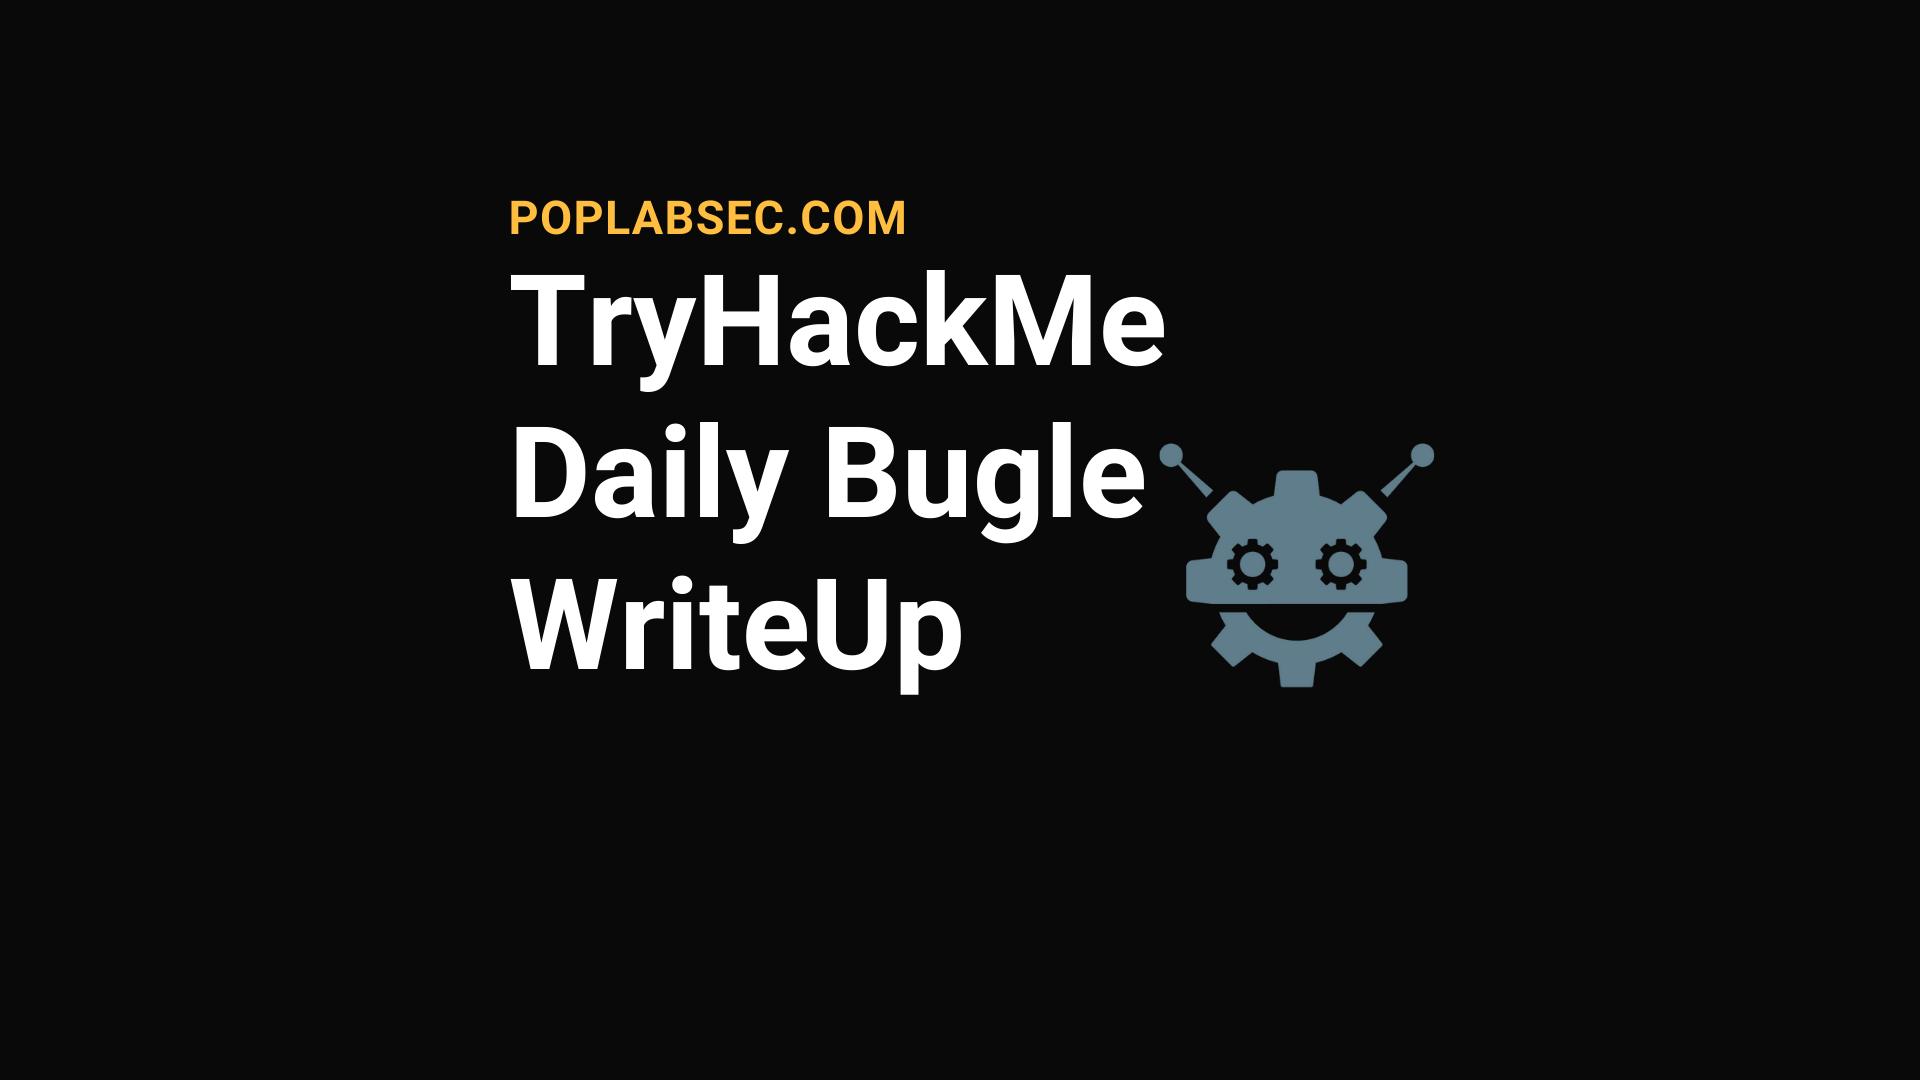 TryHackMe Daily Bugle WriteUp